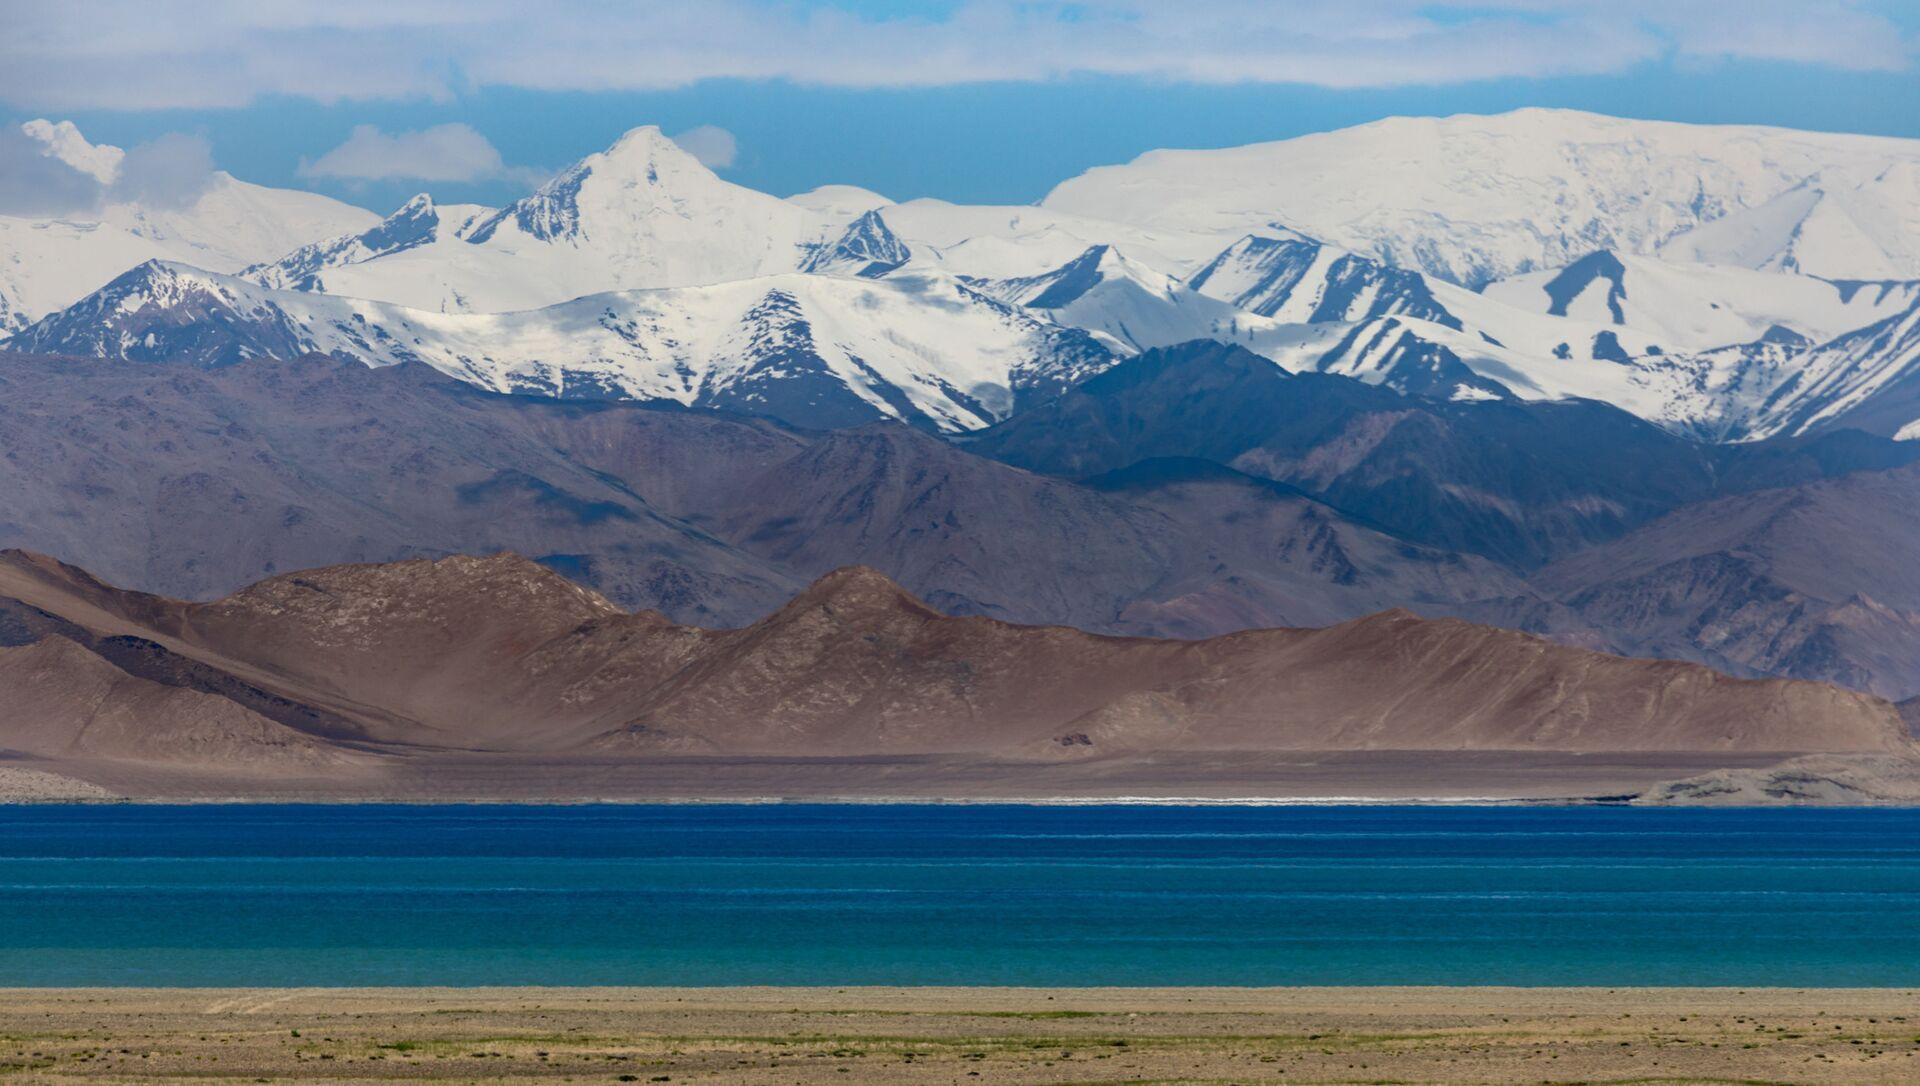 Cordillera del Pamir, Tayikistán - Sputnik Mundo, 1920, 22.11.2020